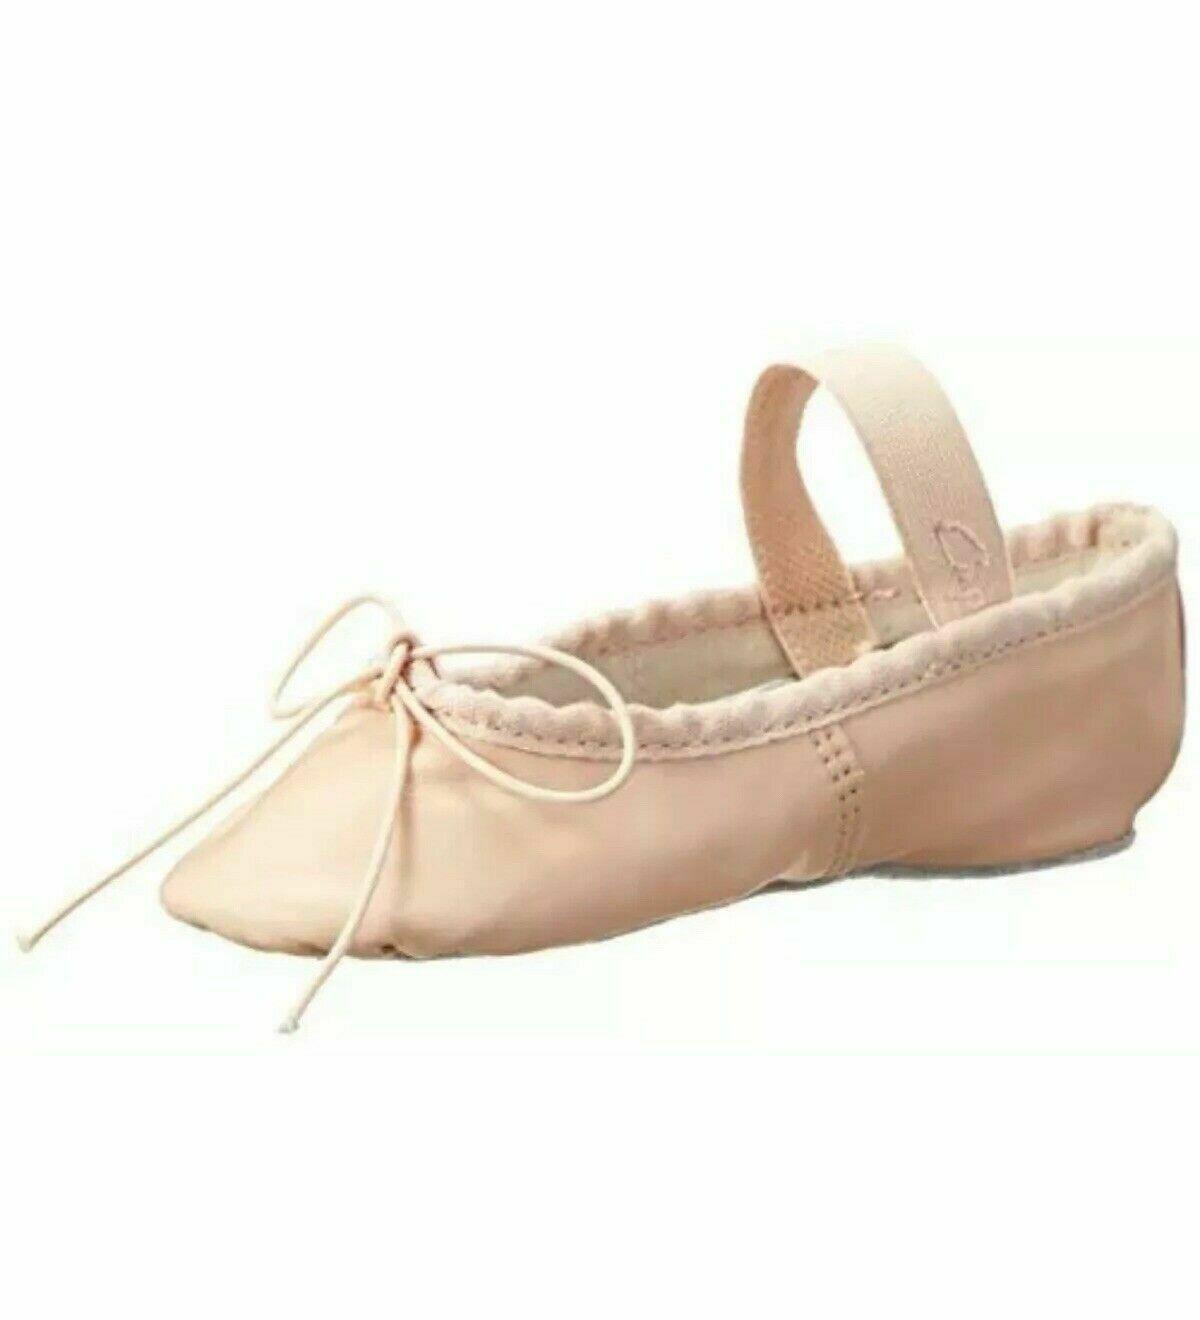 Capezio Youth Teknik 200C NPK Pink Full Sole Ballet Shoe Size 12B 12 B